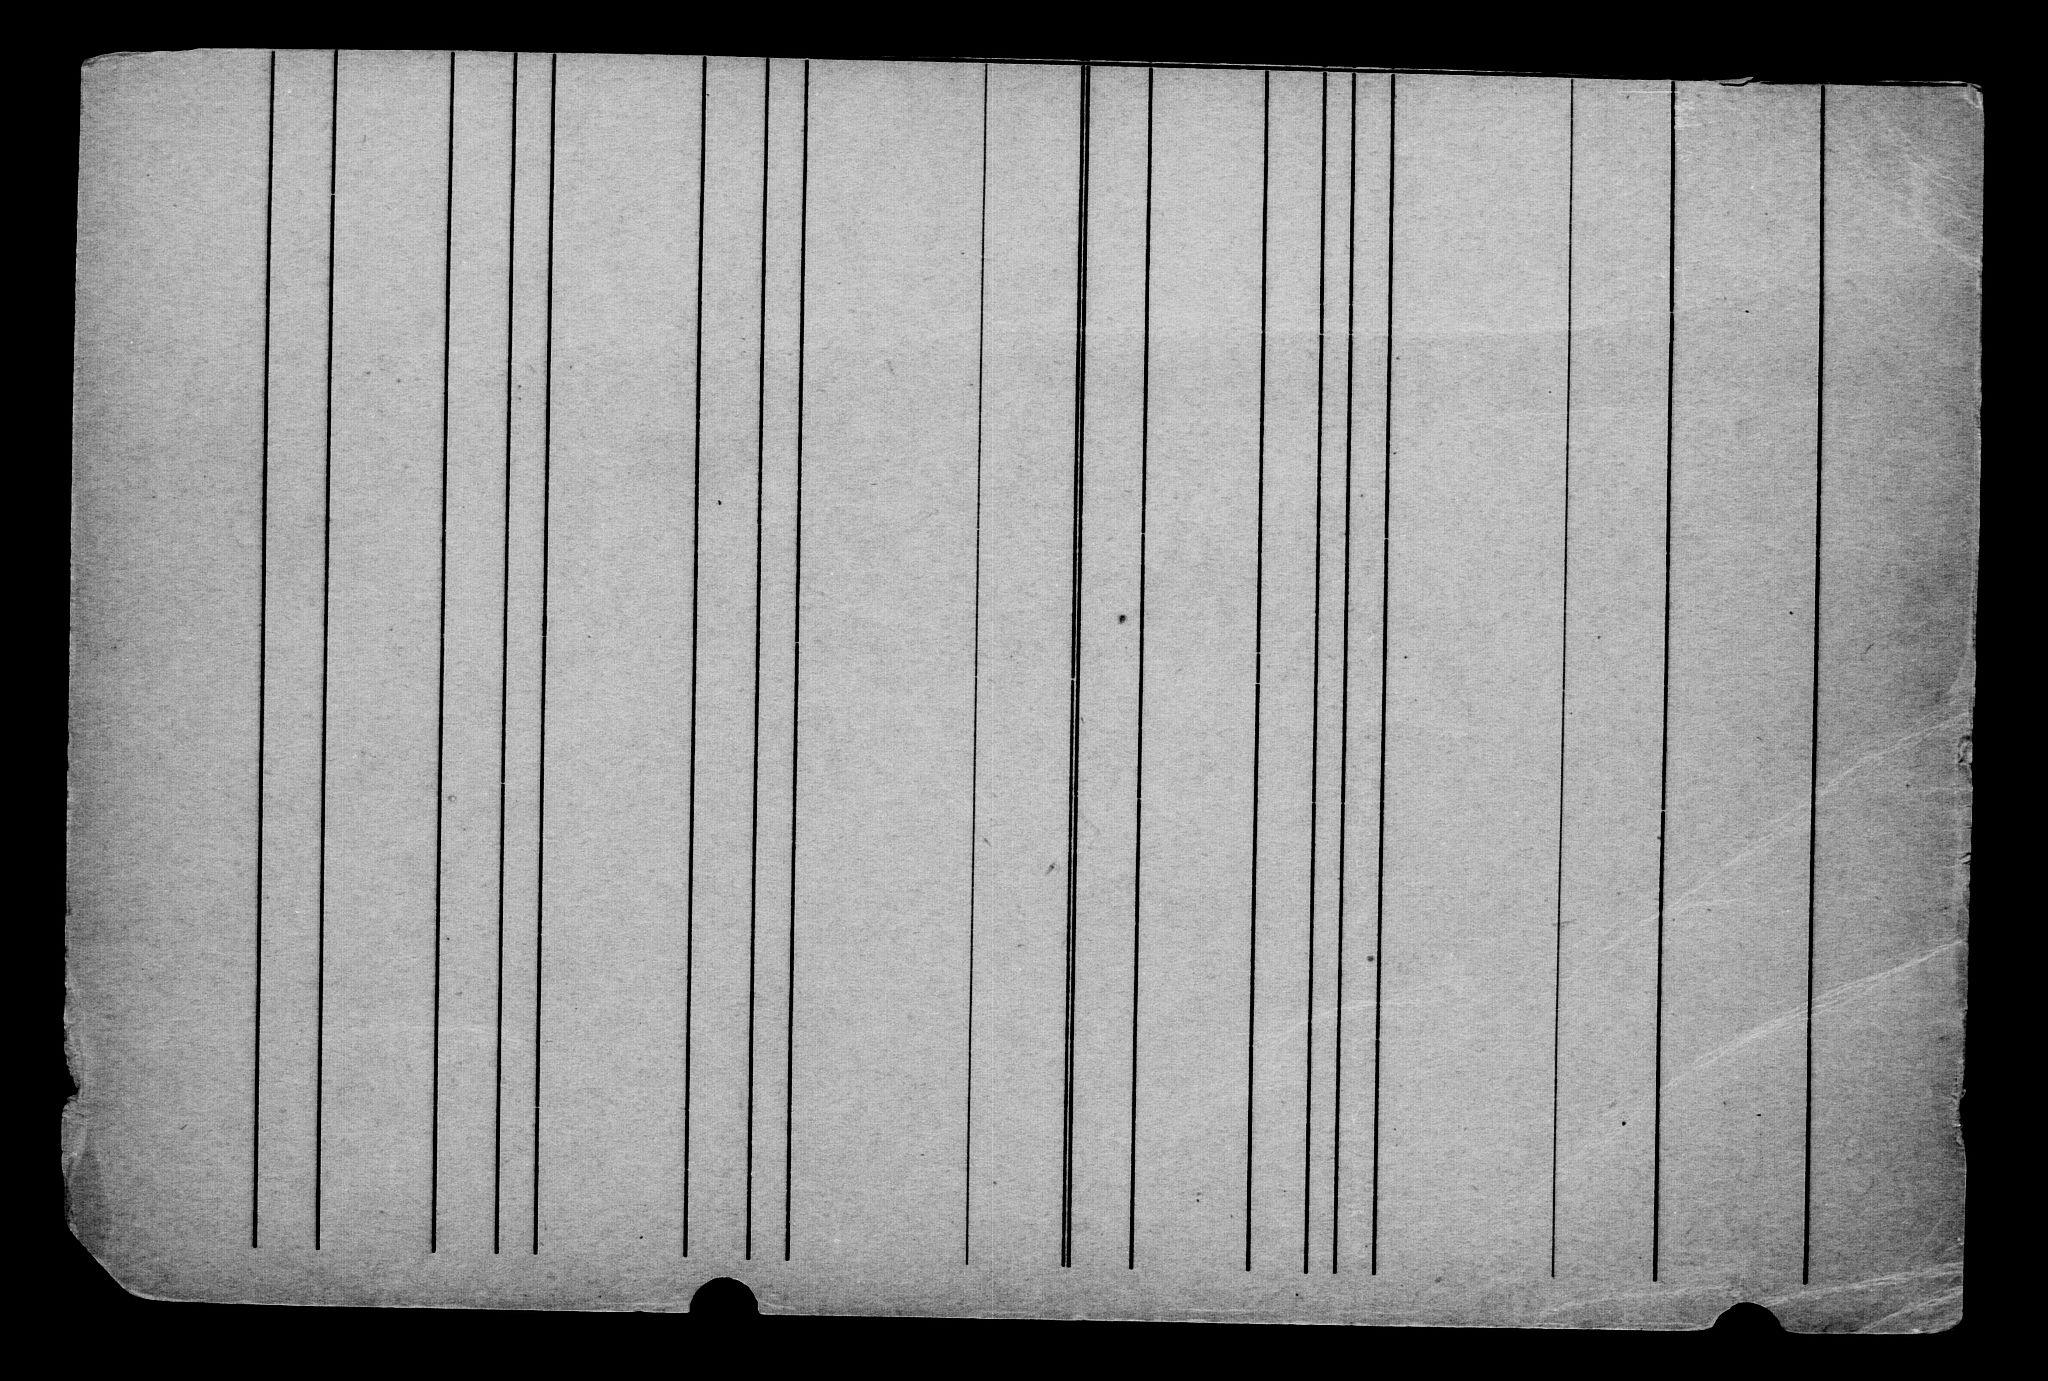 RA, Direktoratet for sjømenn, G/Gb/L0036: Hovedkort, 1900, s. 446